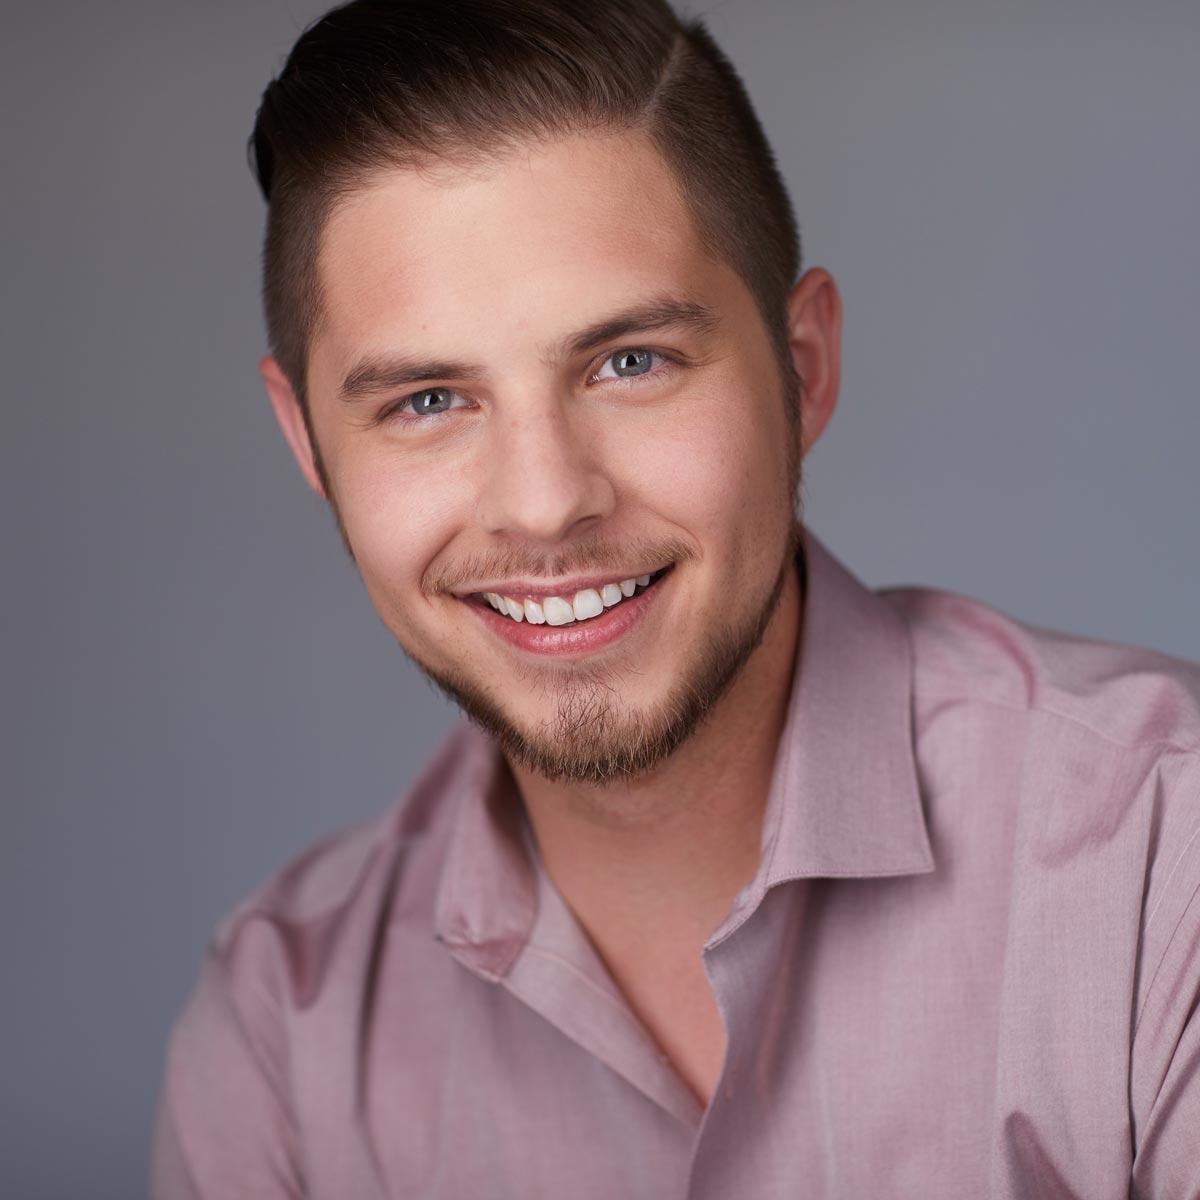 ArtSmart mentor Nate Mattingly